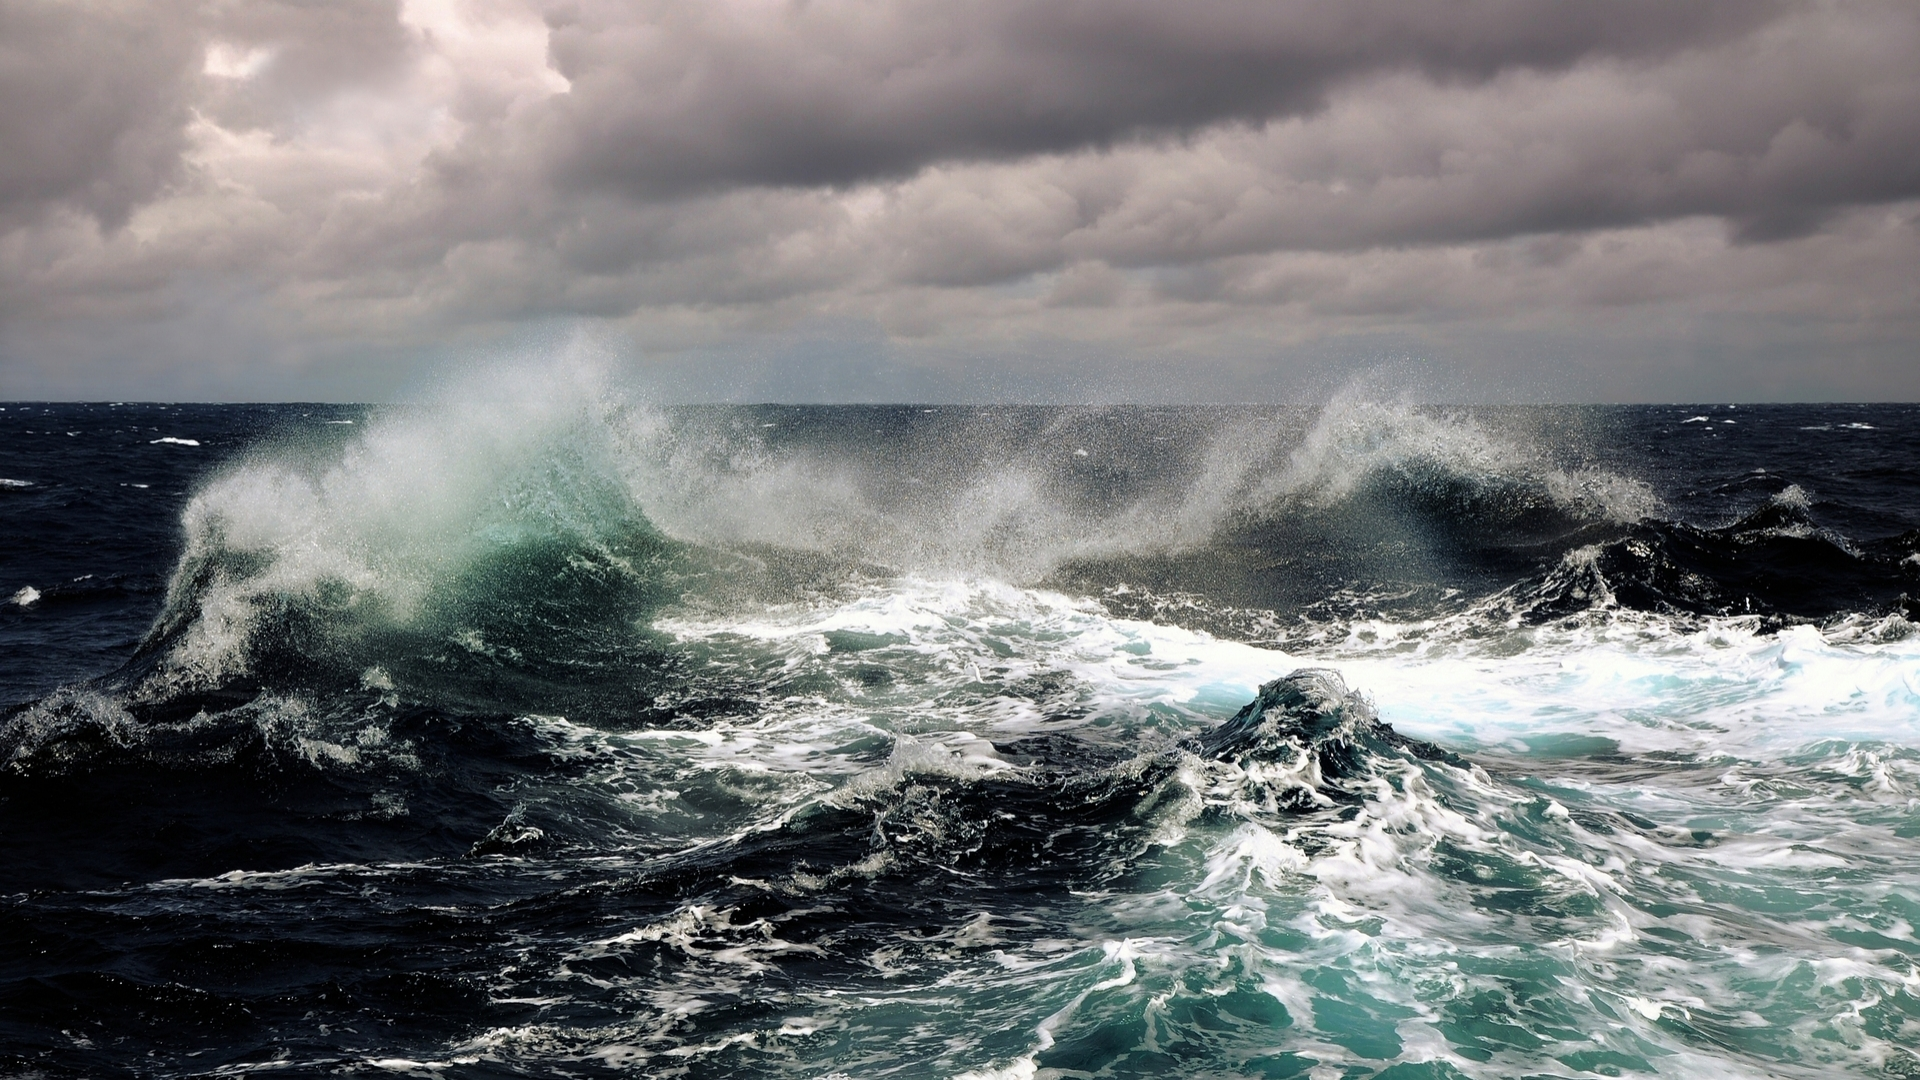 Sea Waves HD Wallpaper 1920x1080